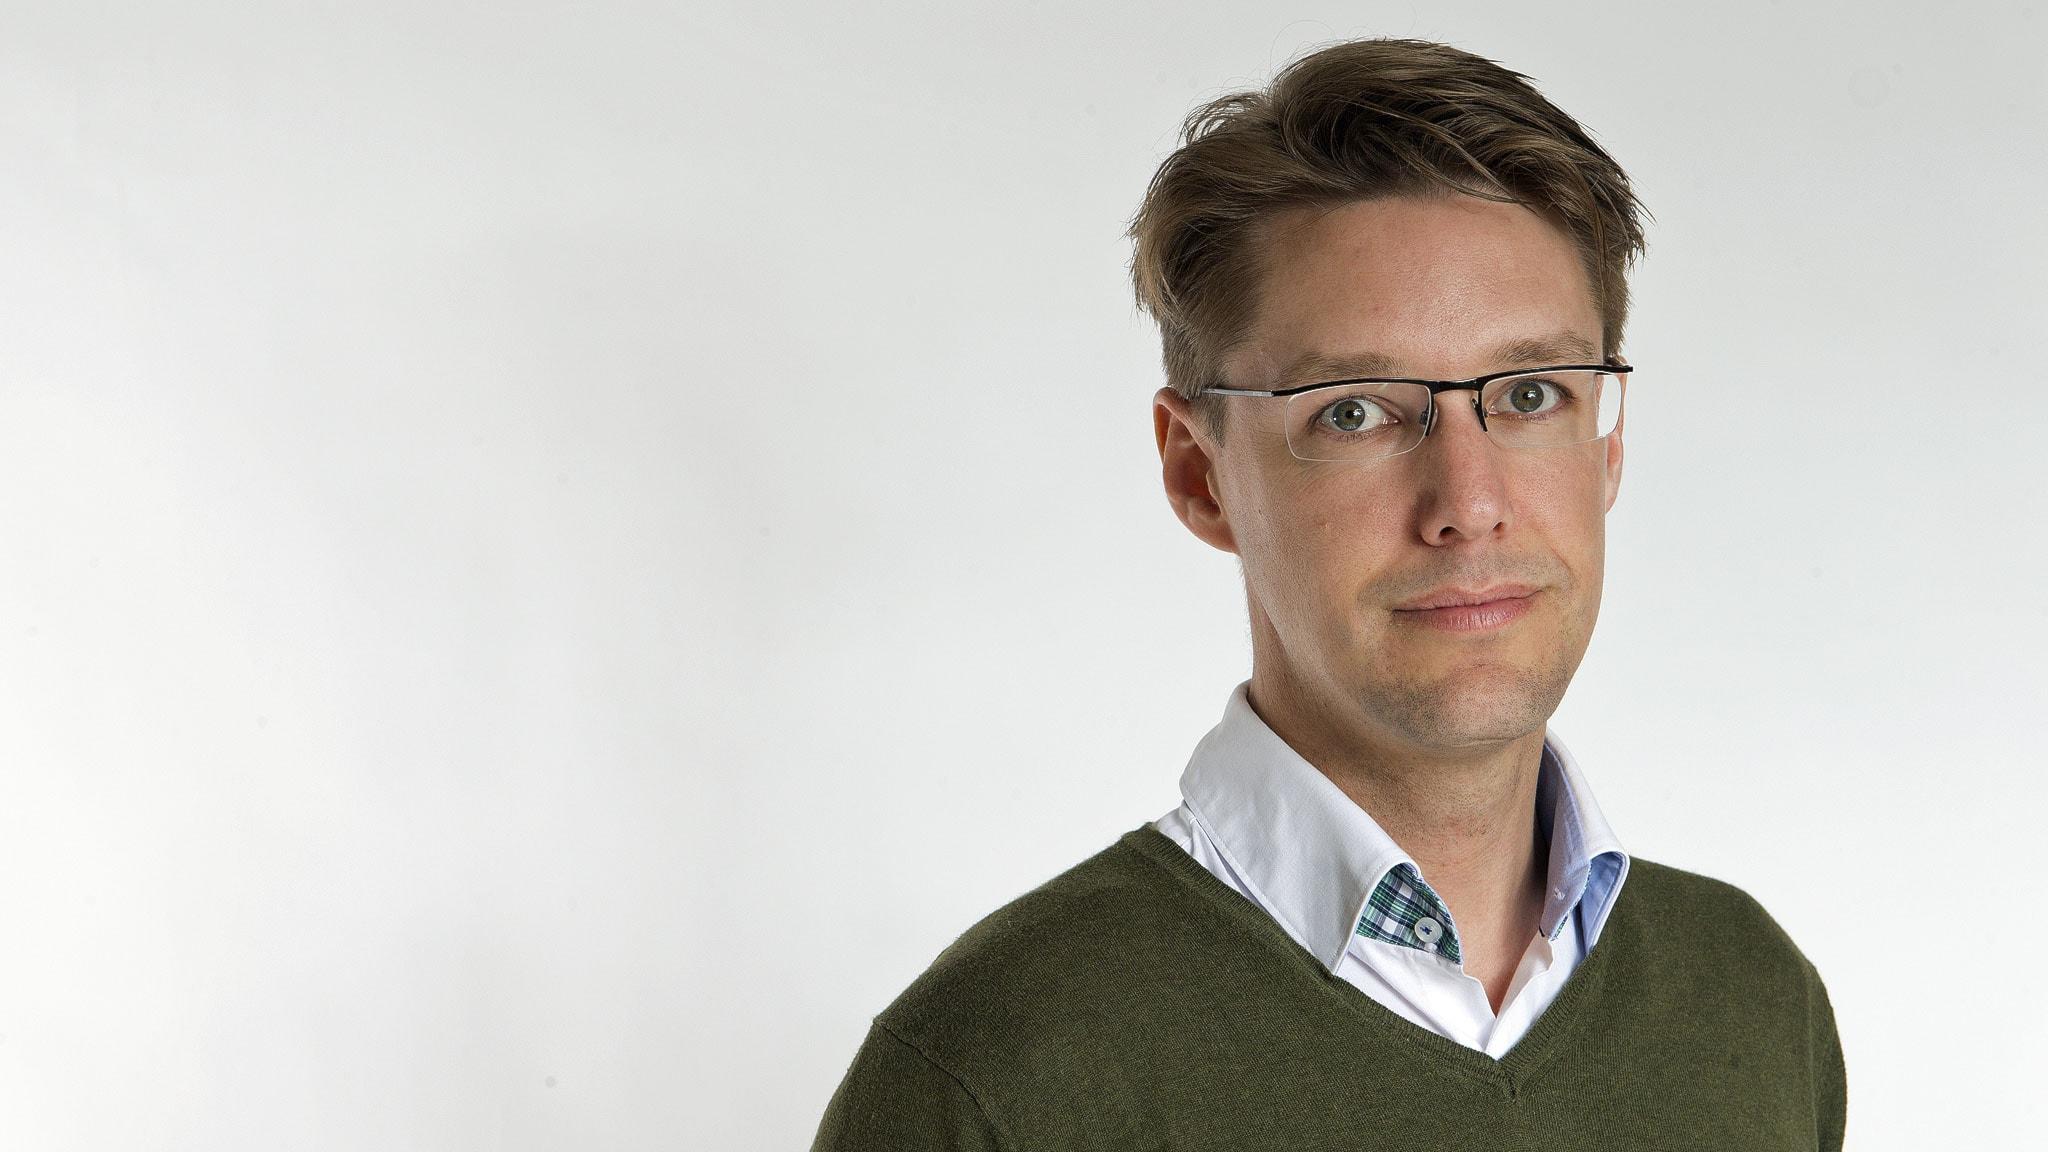 Blitzcrank partnervermittlung Sebastian Kienles Rad für Hawaii , triathlon - Insider. Coach. Experte.